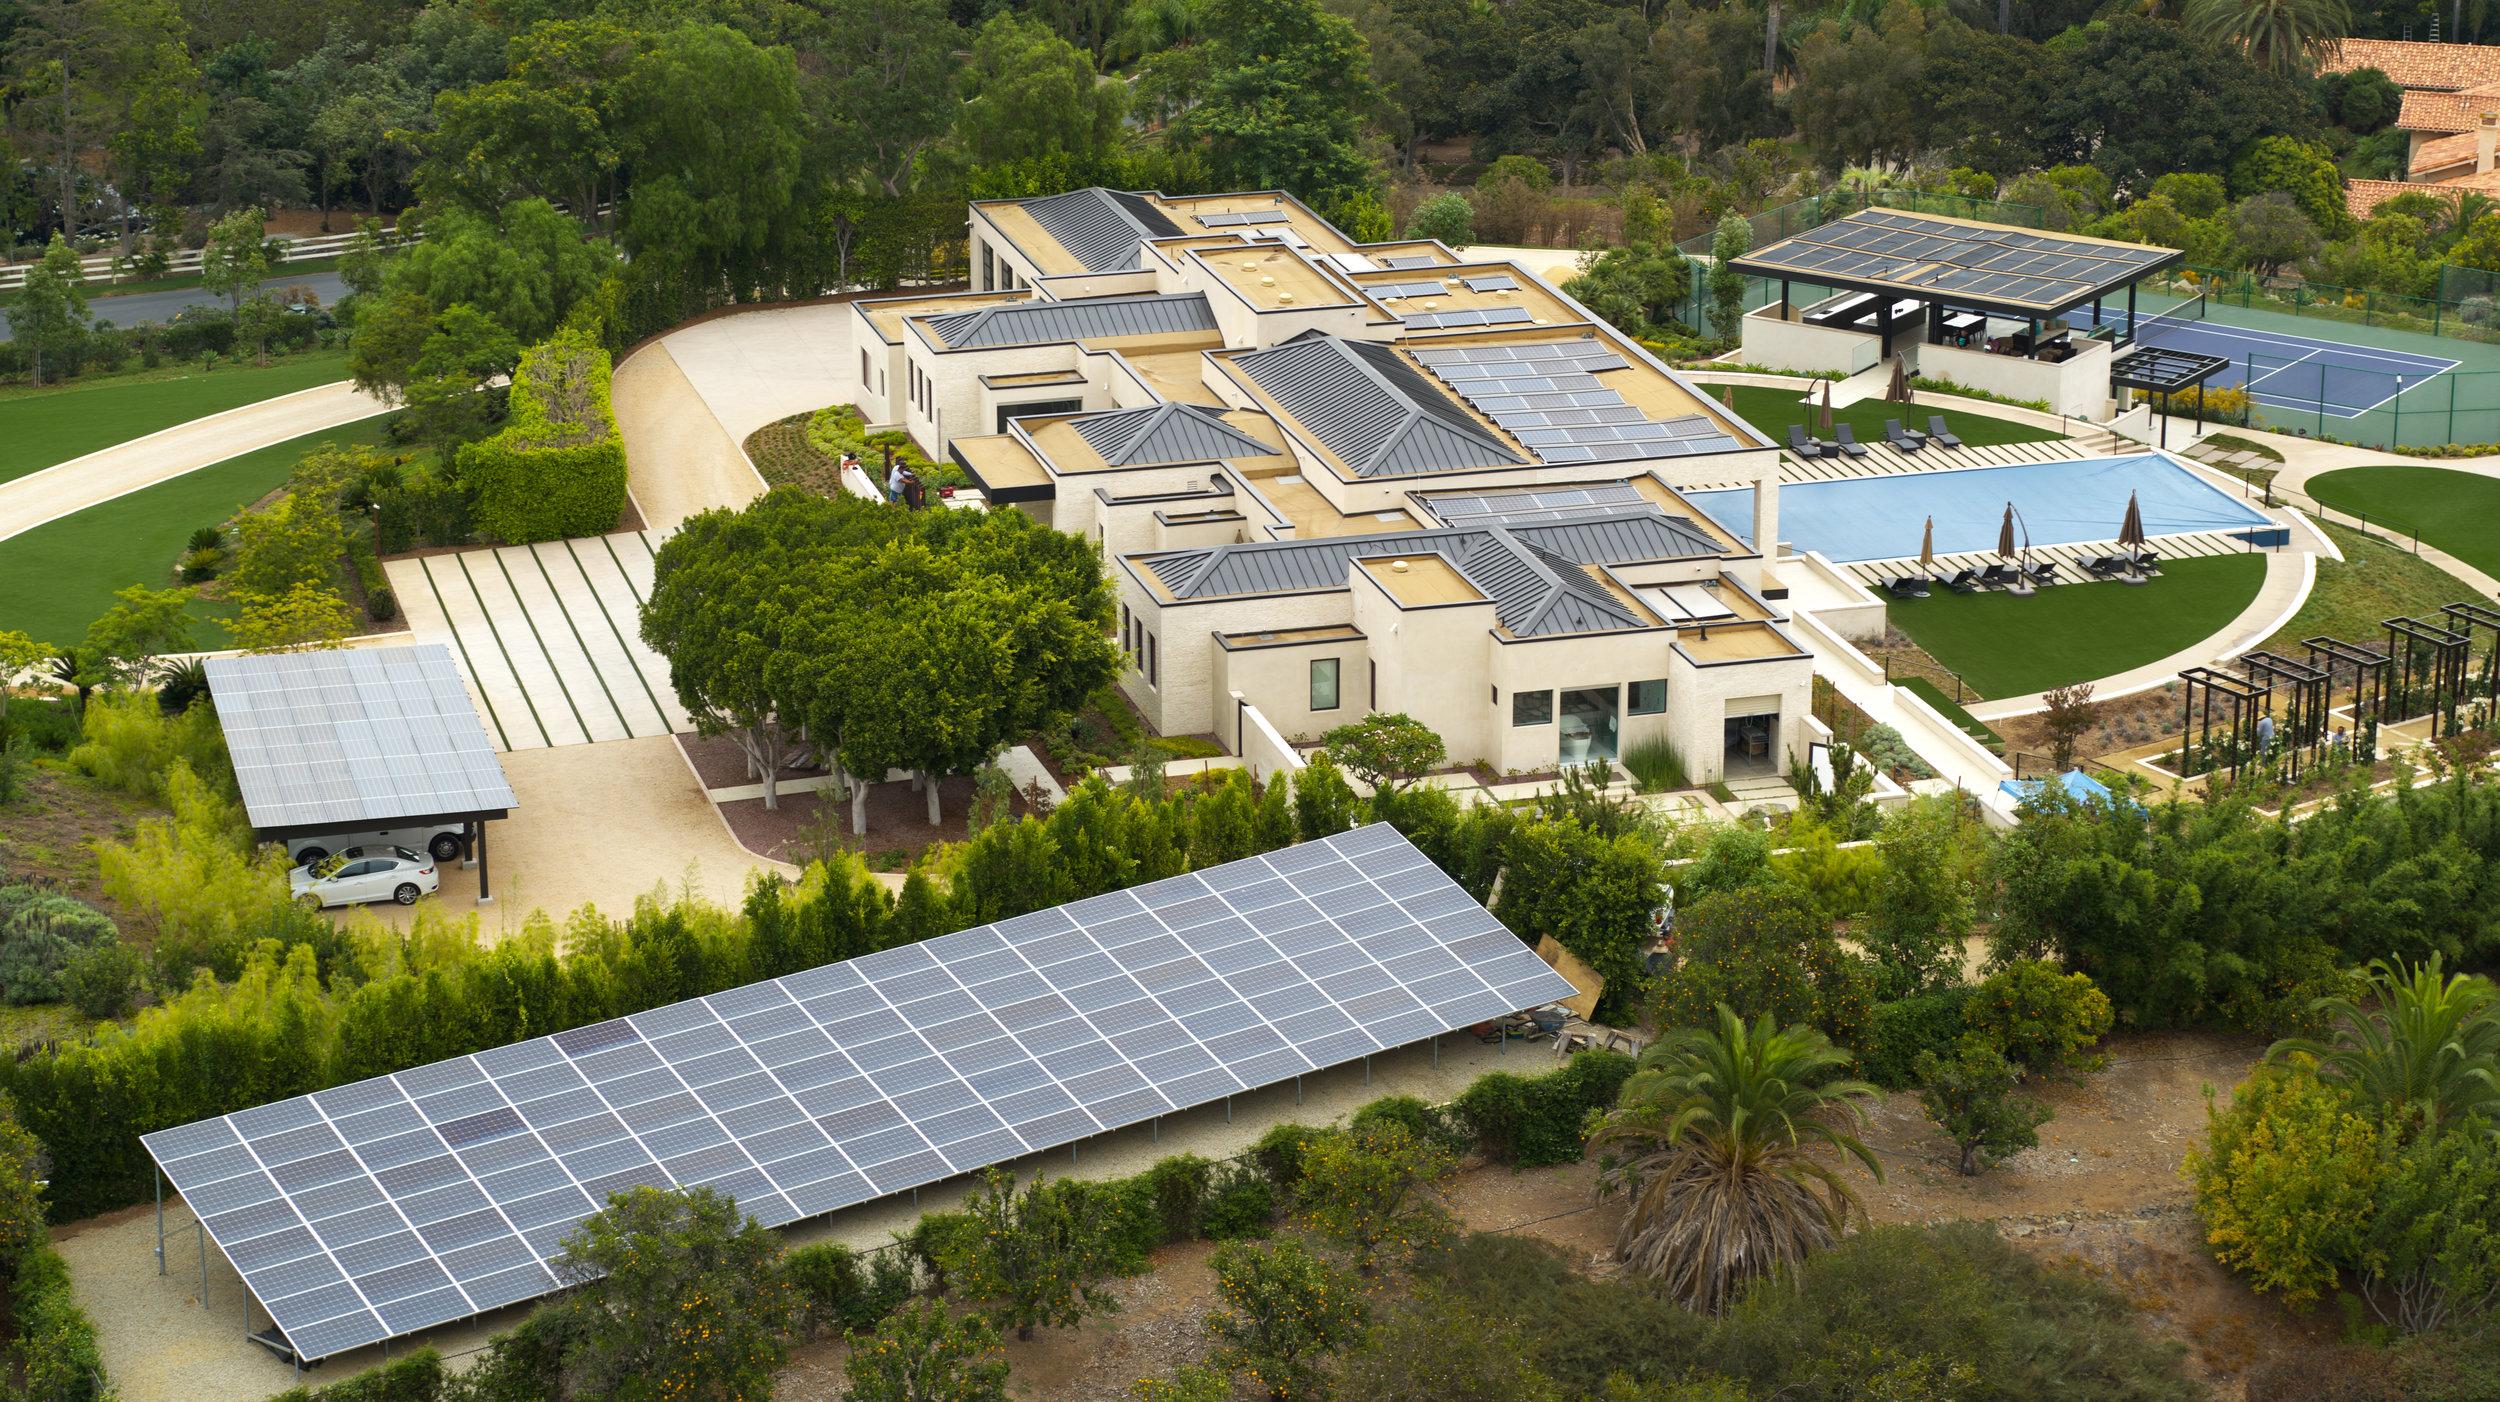 Symphony solar project in rancho santa fe, ca